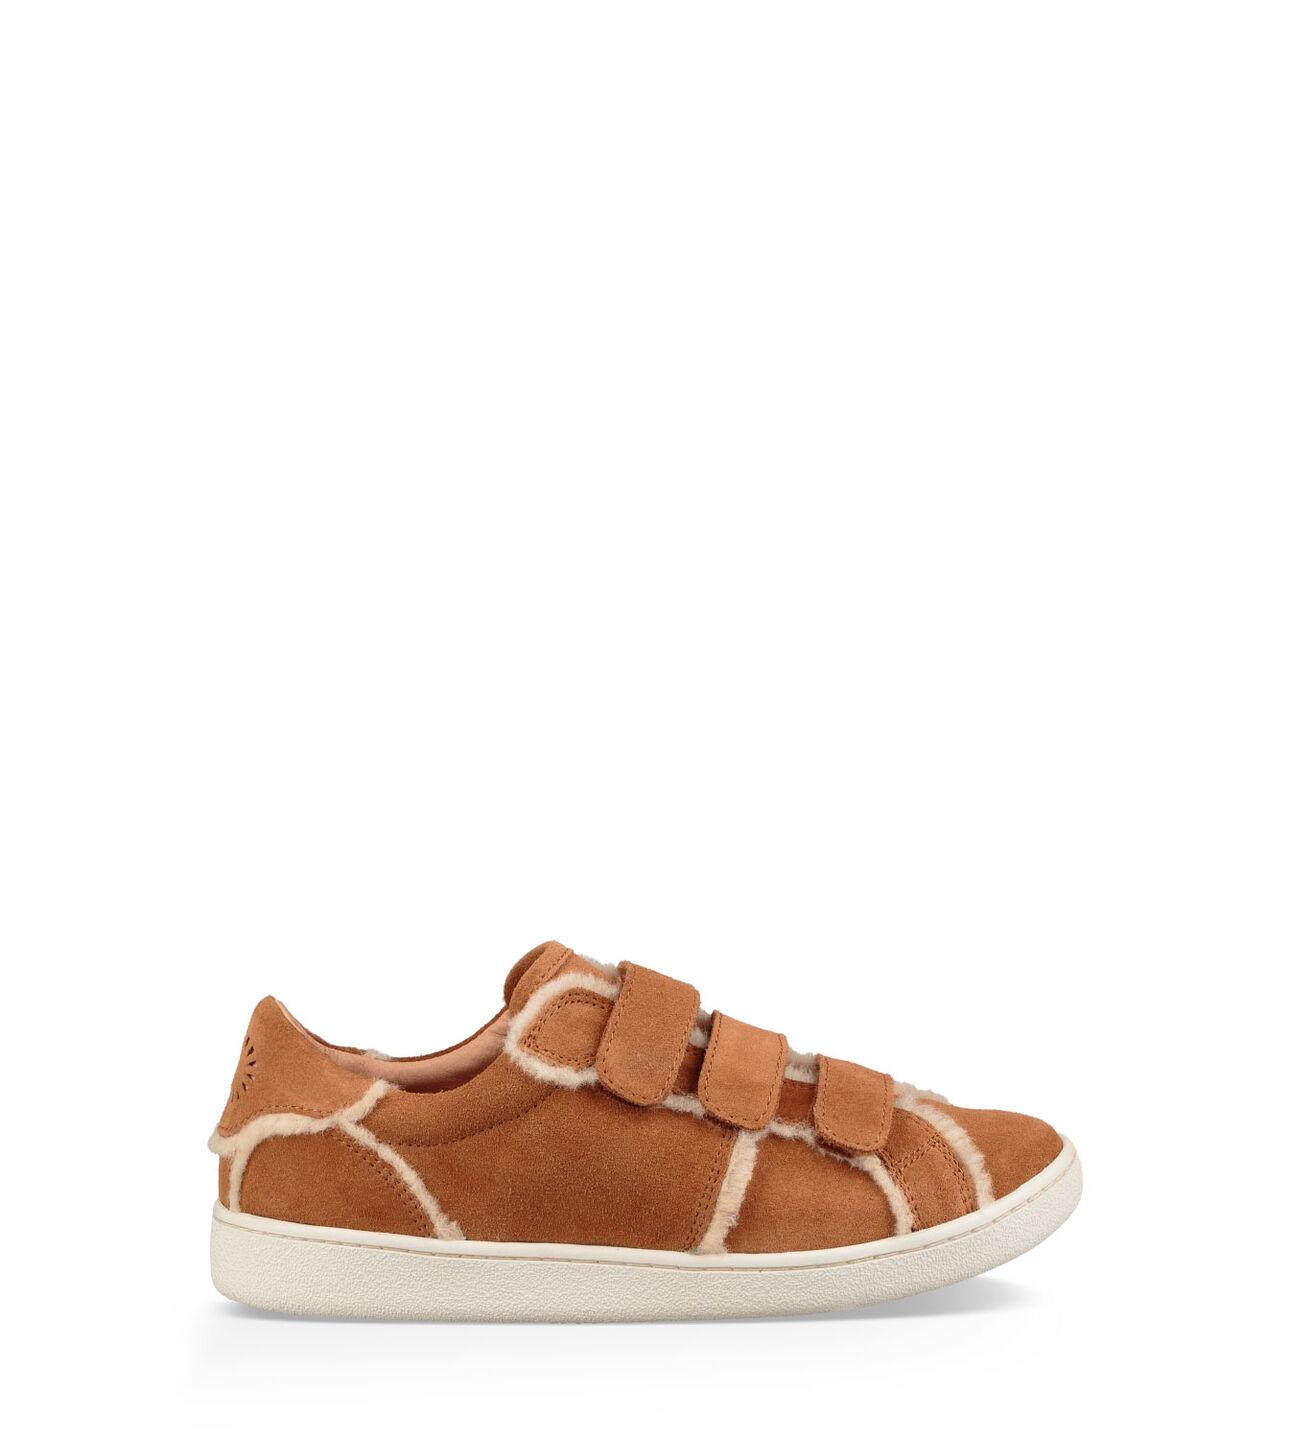 6cbb1569a5a Alix Spill Seam Sneaker